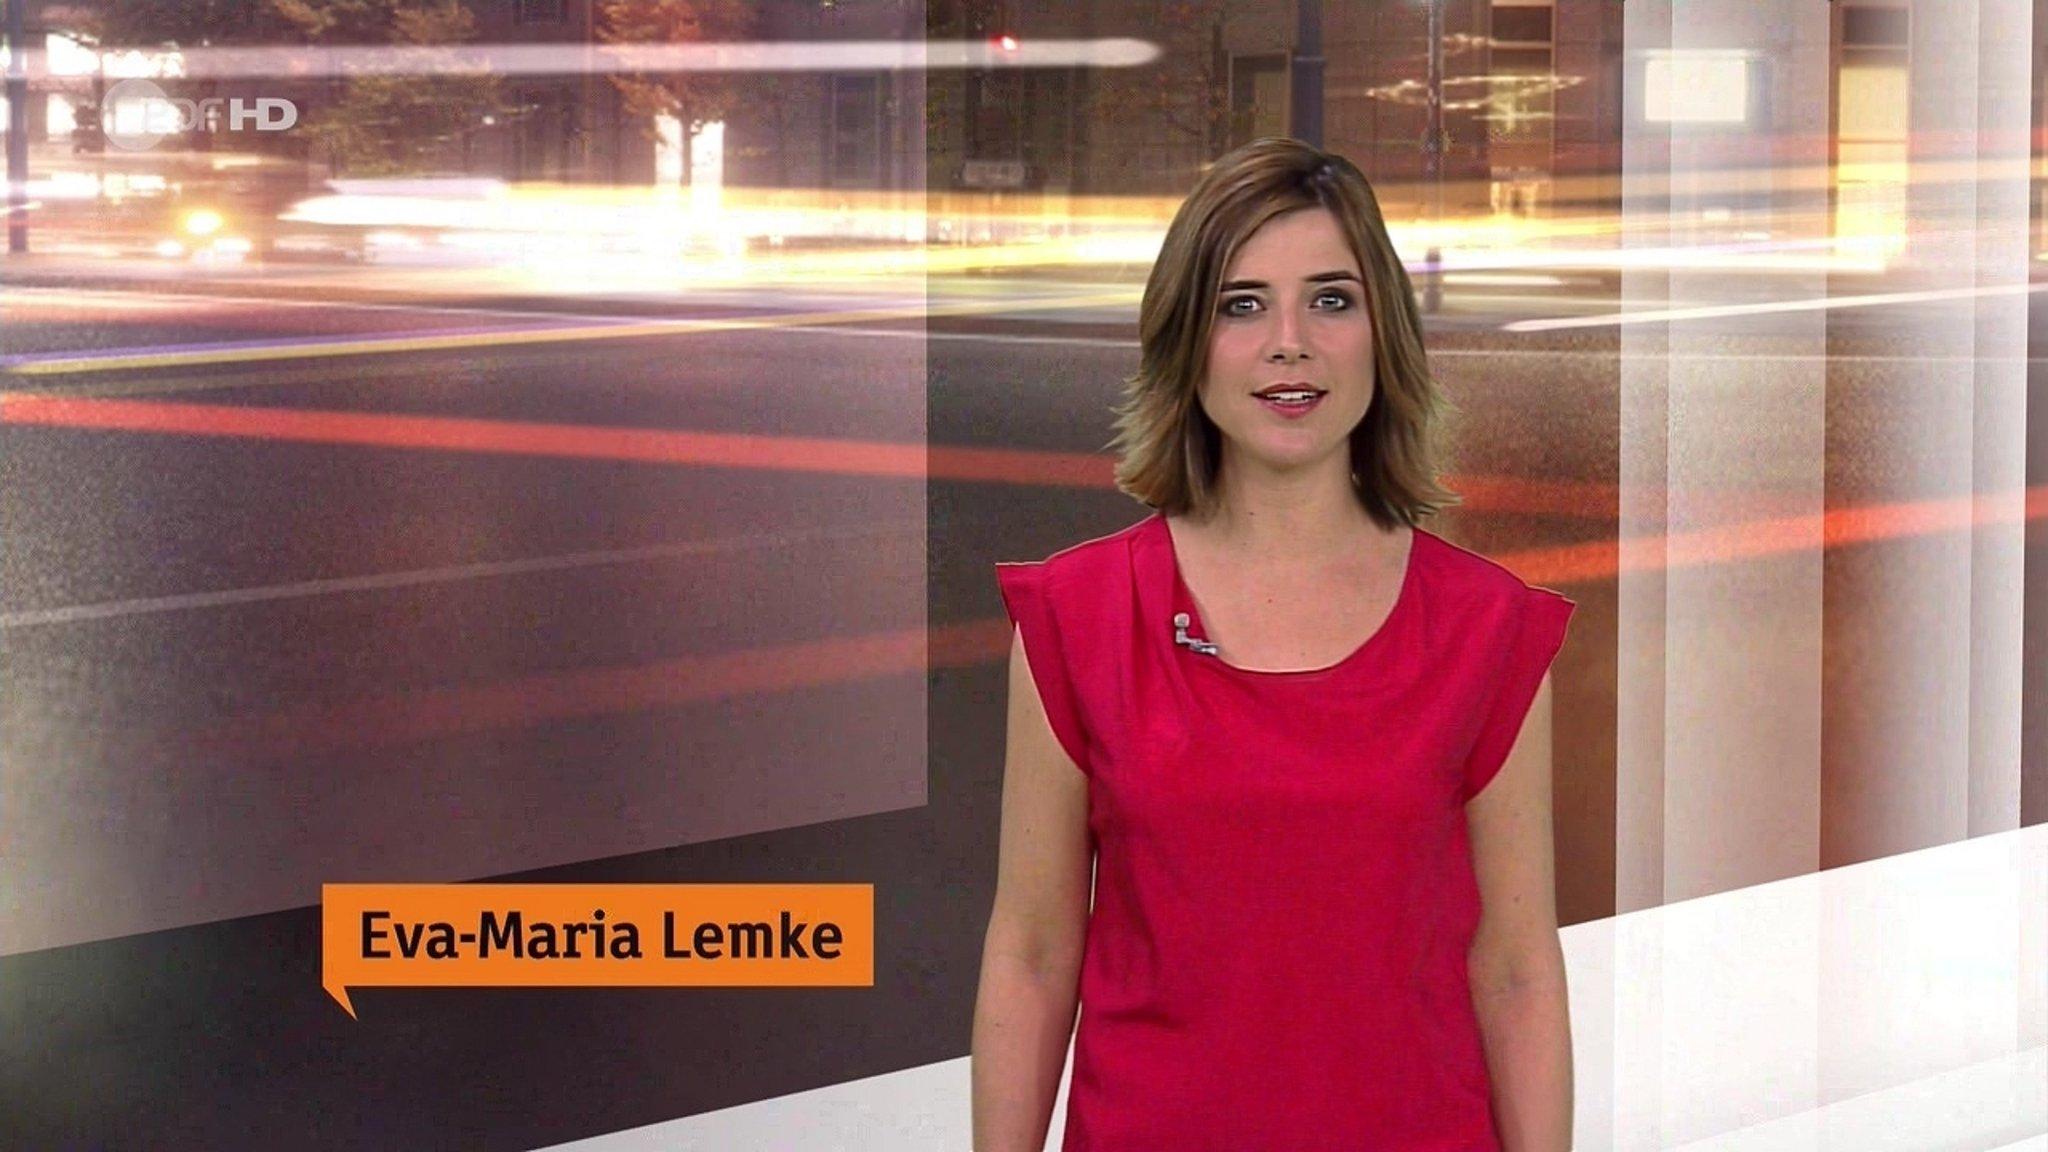 Bild 2 aus Beitrag: Eva-Maria Lemke tröstet Fans wegen